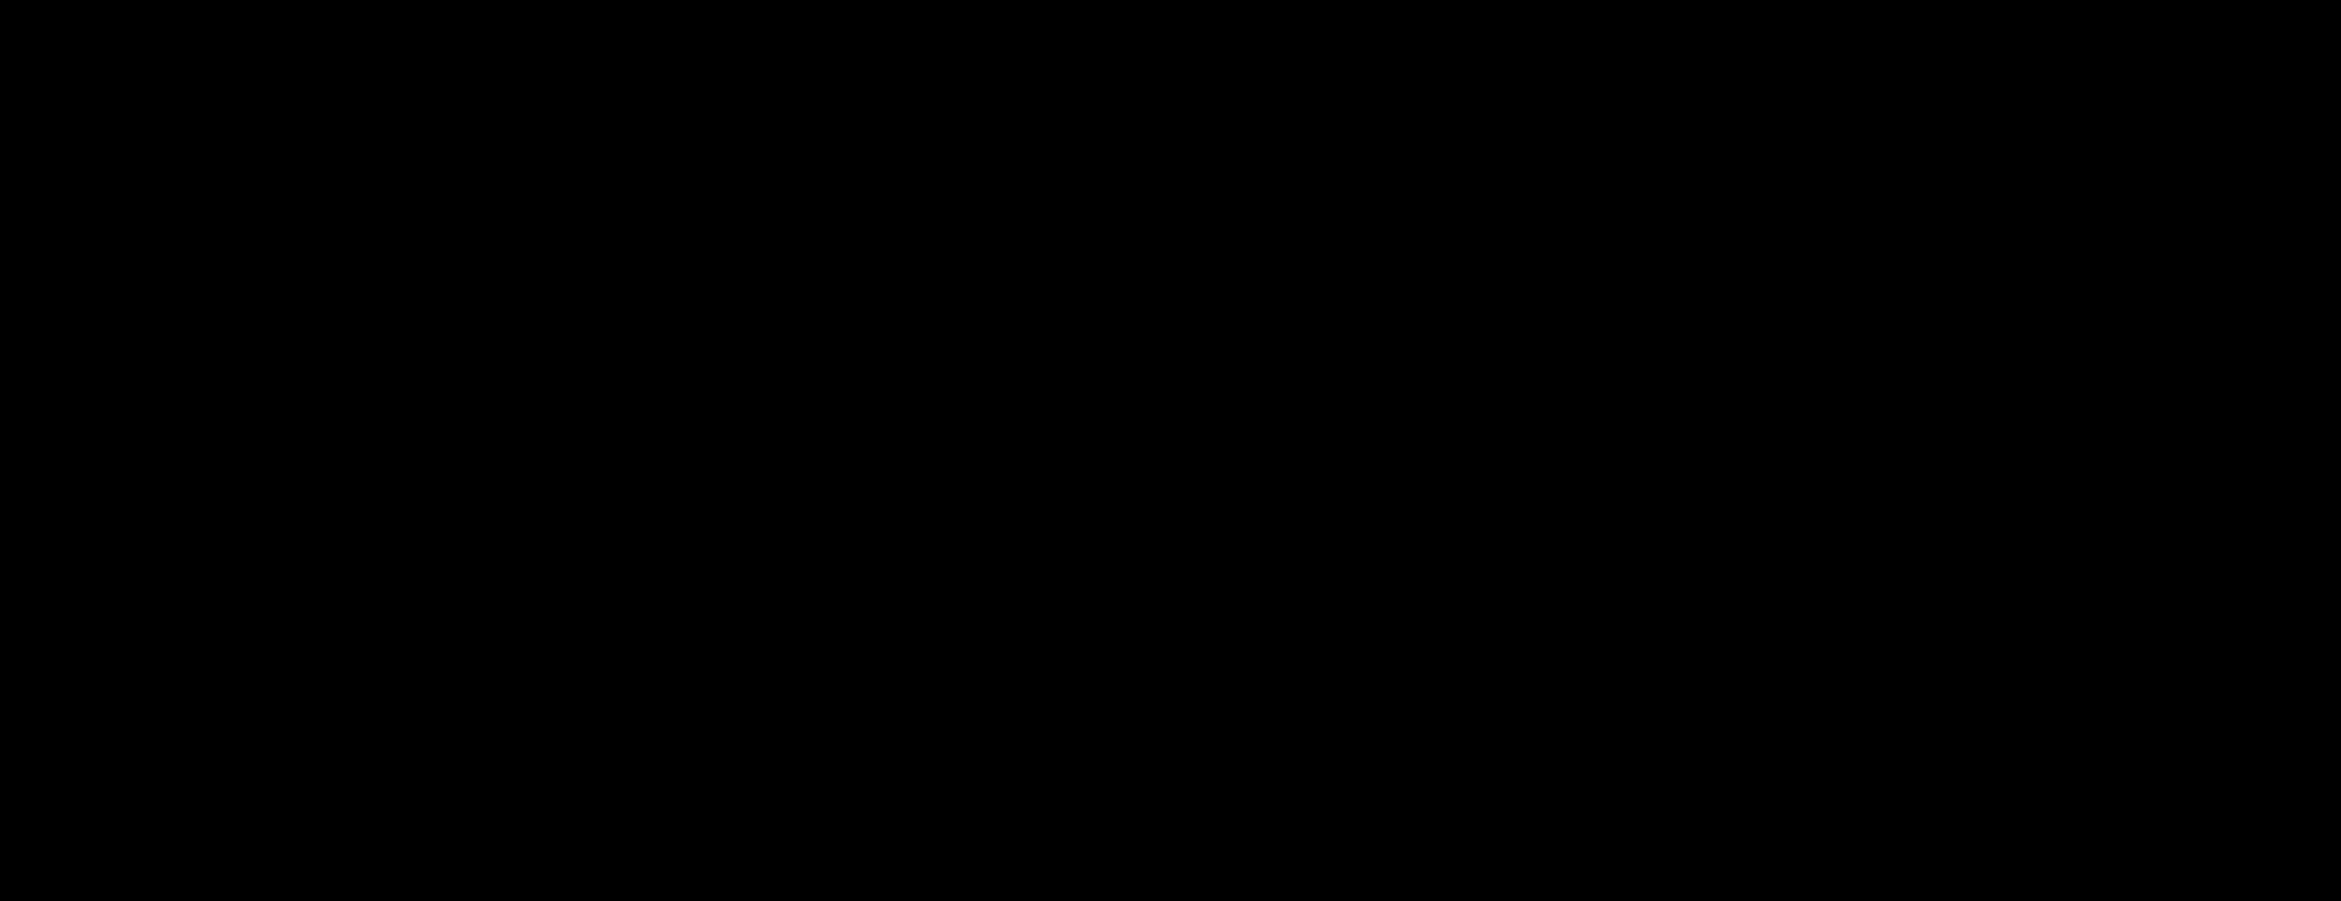 EFF2-01